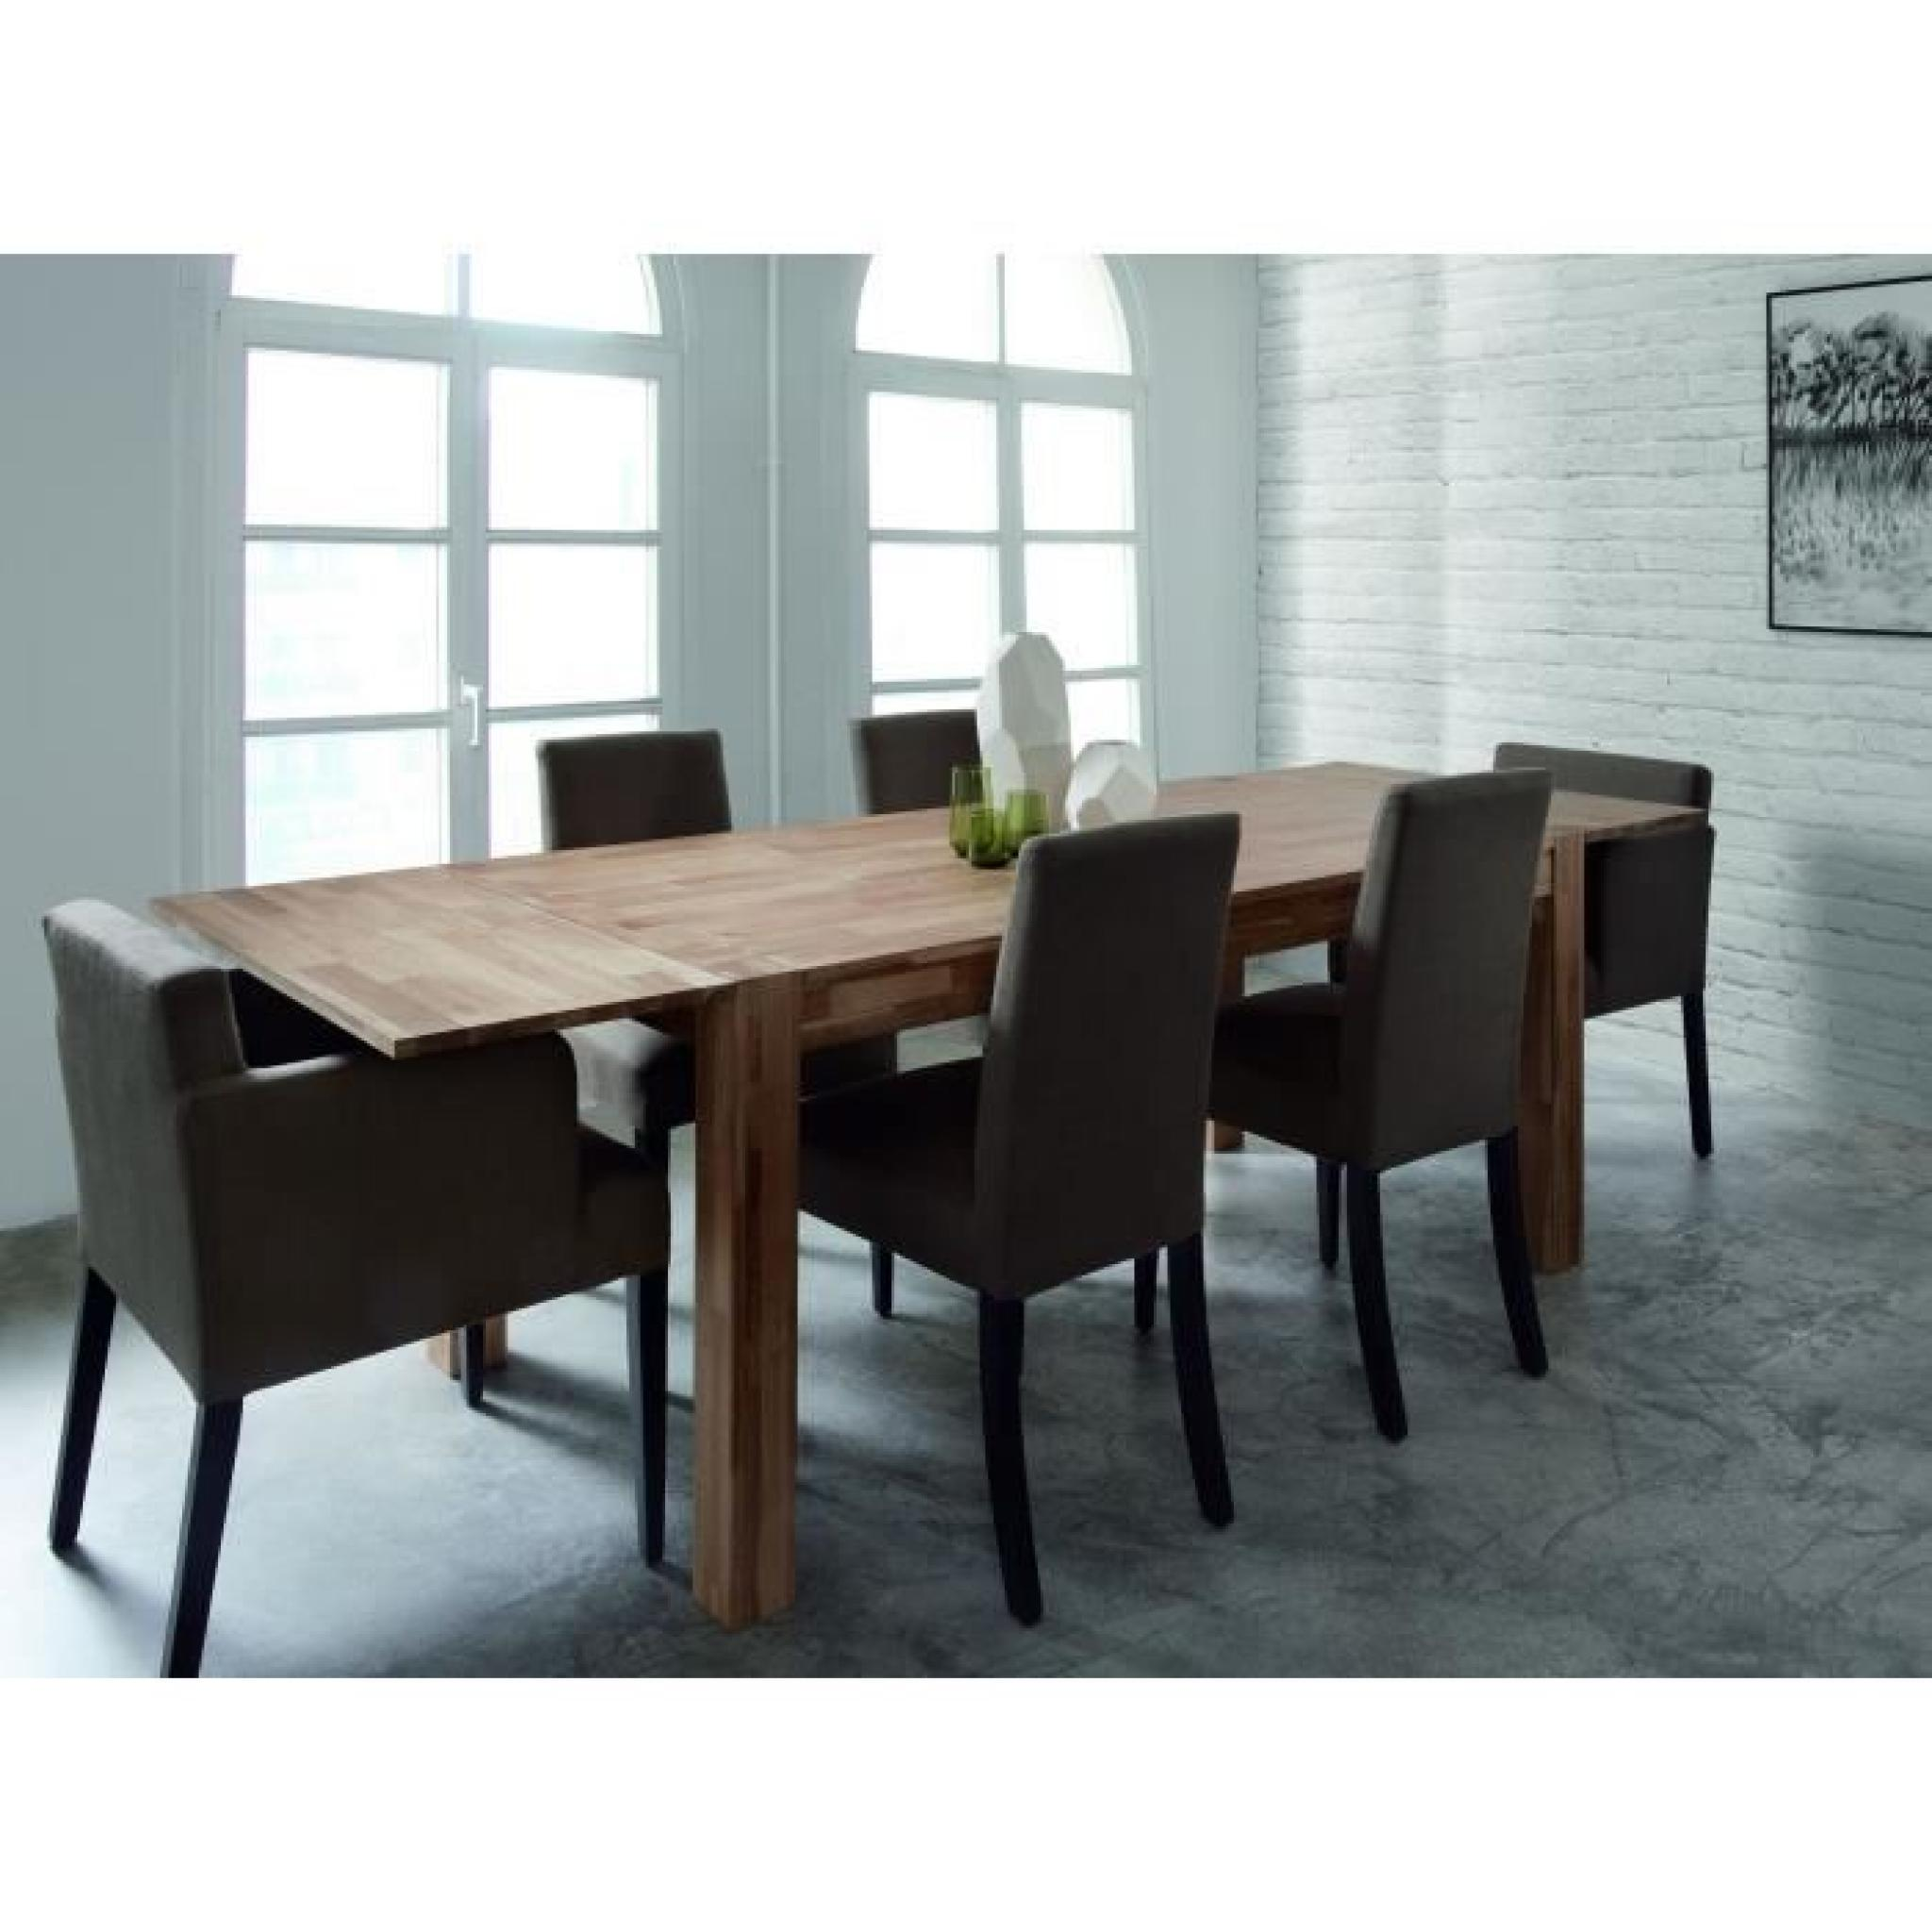 miles table extensible ch ne massif 150 230cm achat vente table salle a manger pas cher. Black Bedroom Furniture Sets. Home Design Ideas